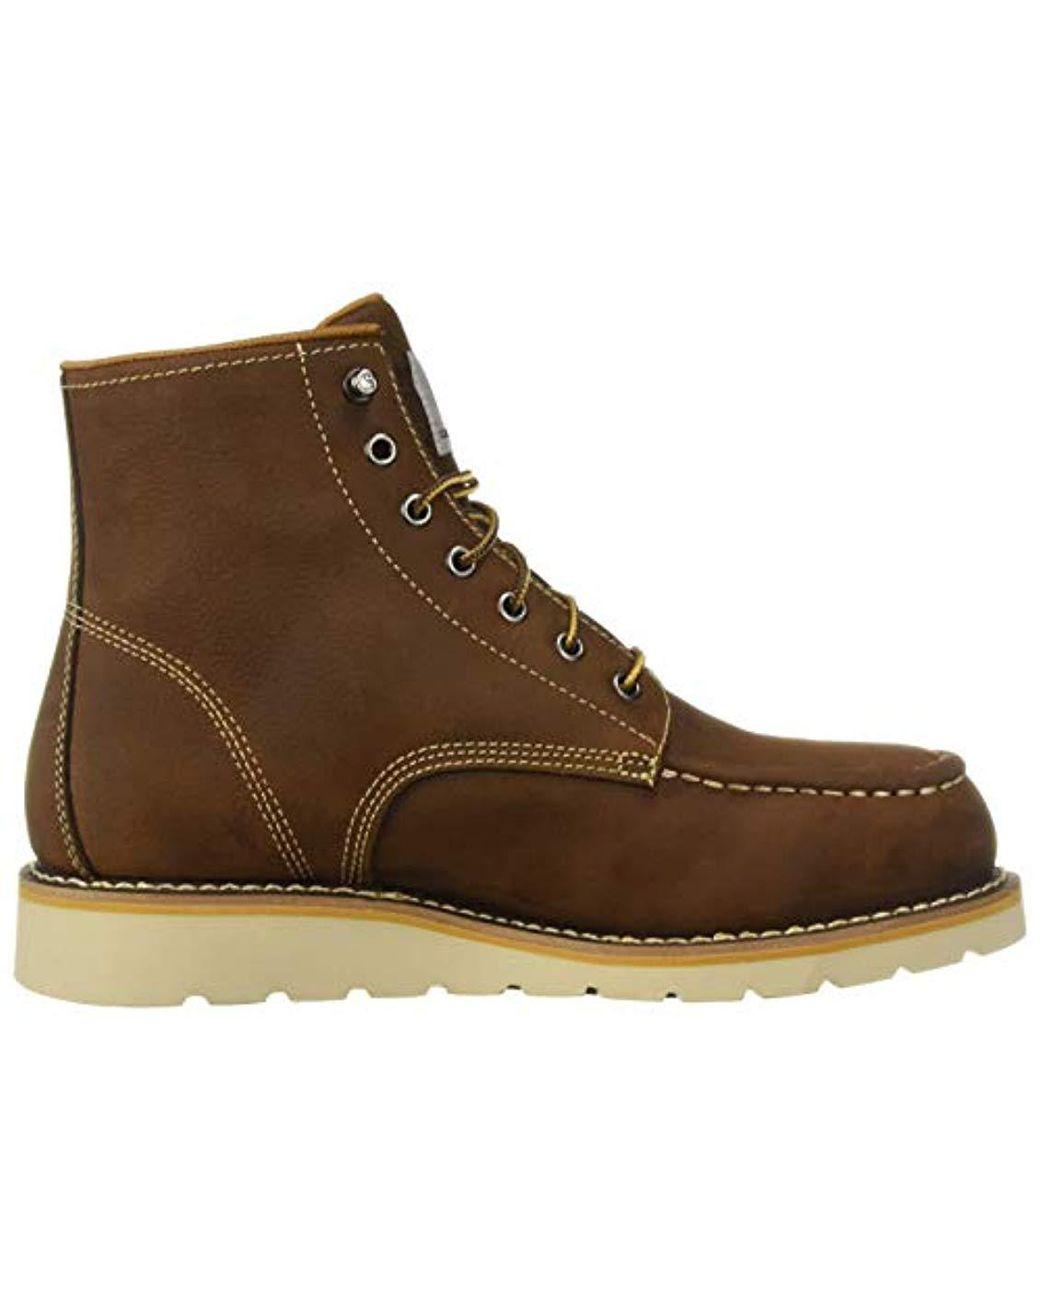 865430975e9 Women's Brown 6 Inch Waterproof Wedge Boot Steel Toe Industrial